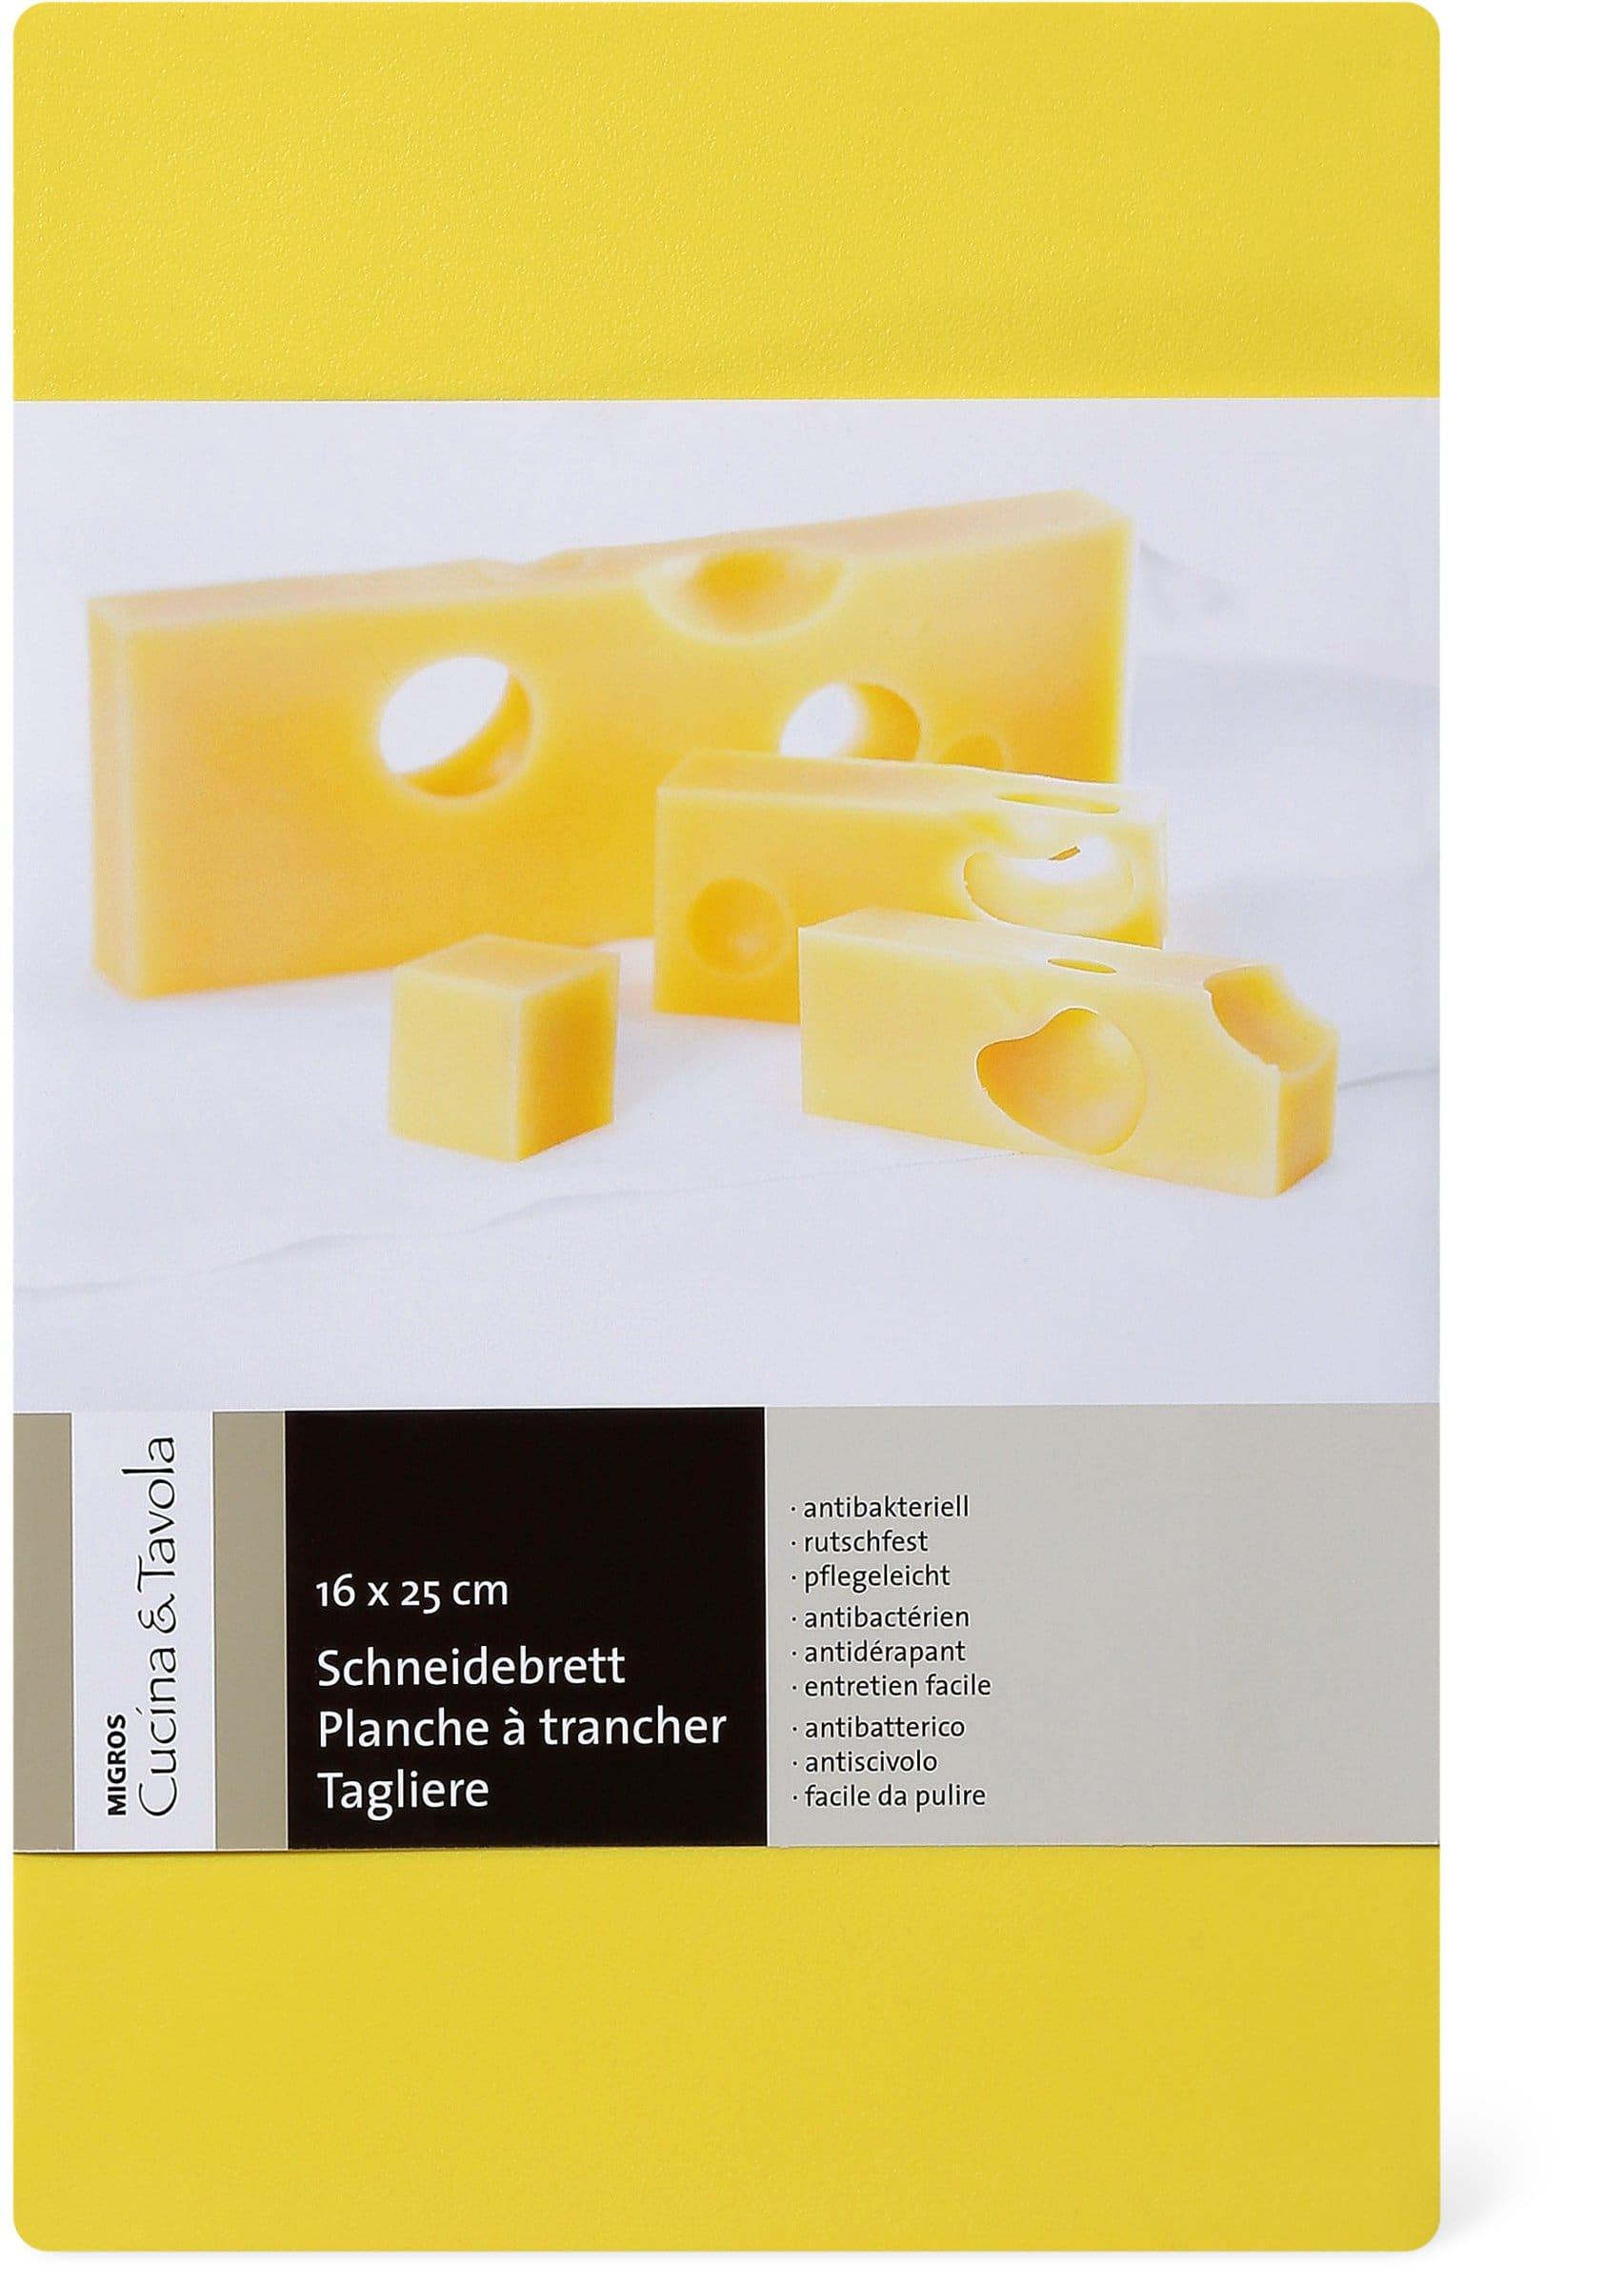 Cucina & Tavola Schneidebrett